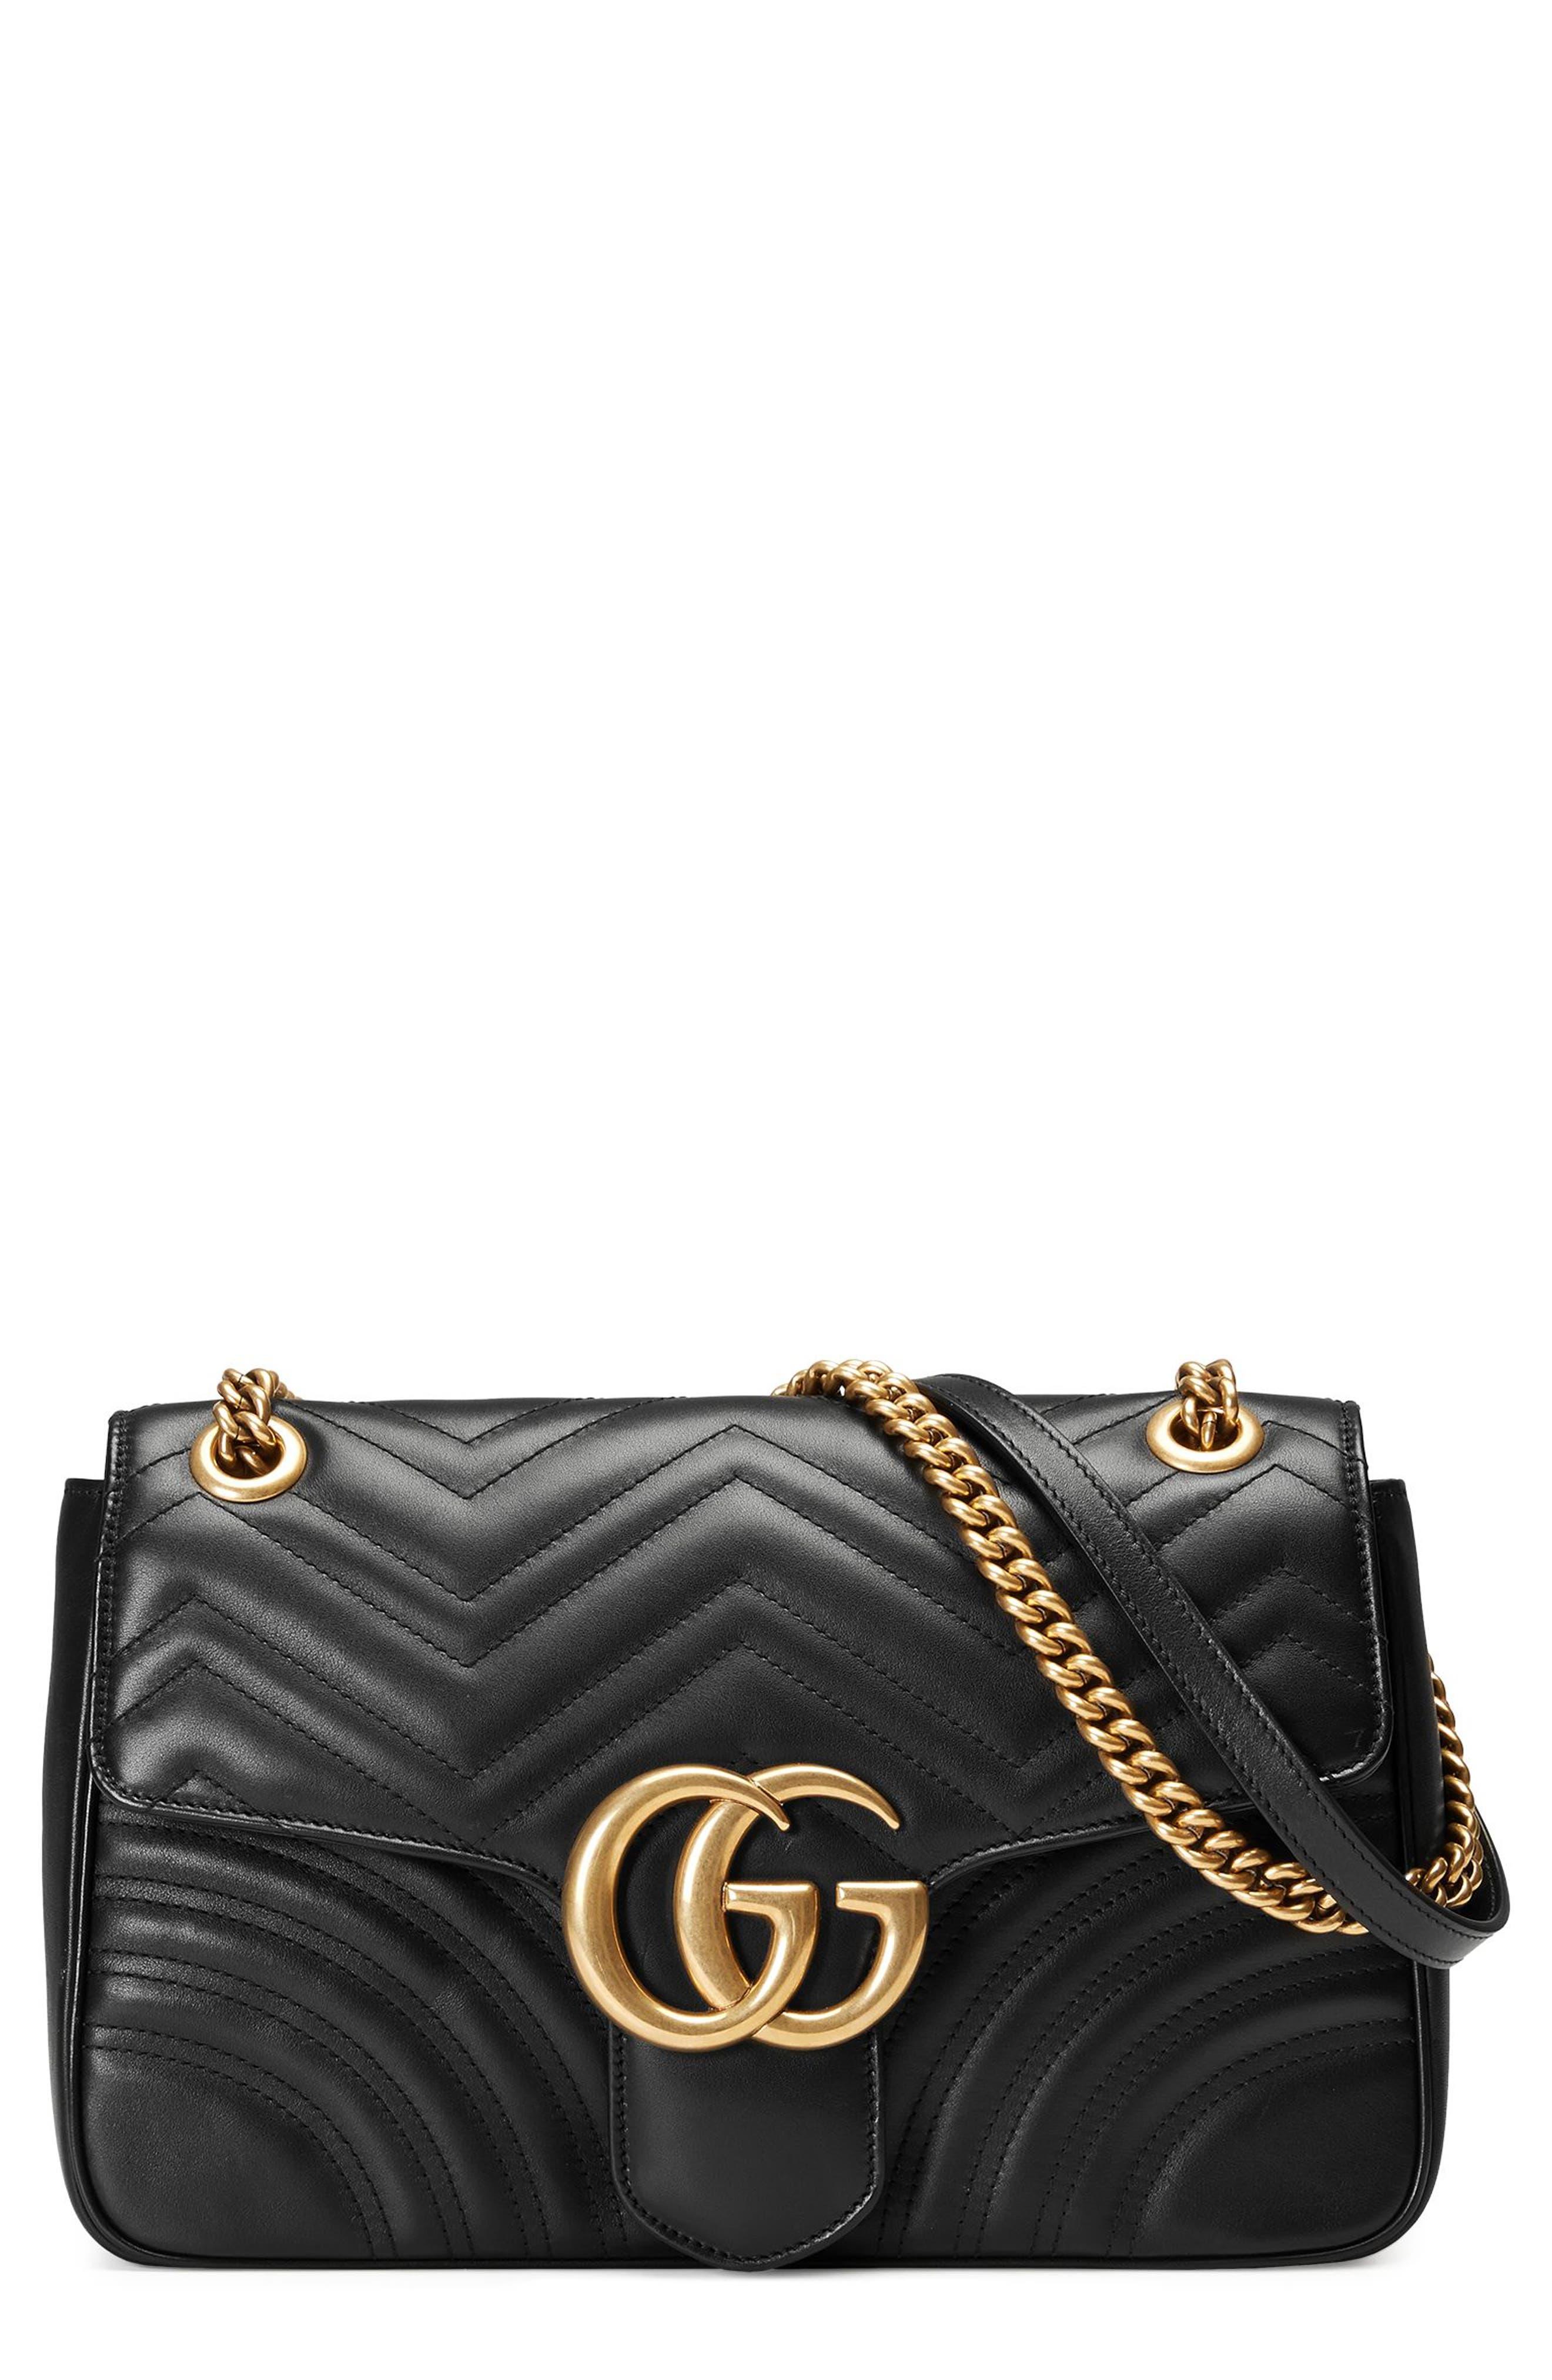 Alternate Image 1 Selected - Gucci Medium GG Marmont 2.0 Matelassé Leather Shoulder Bag